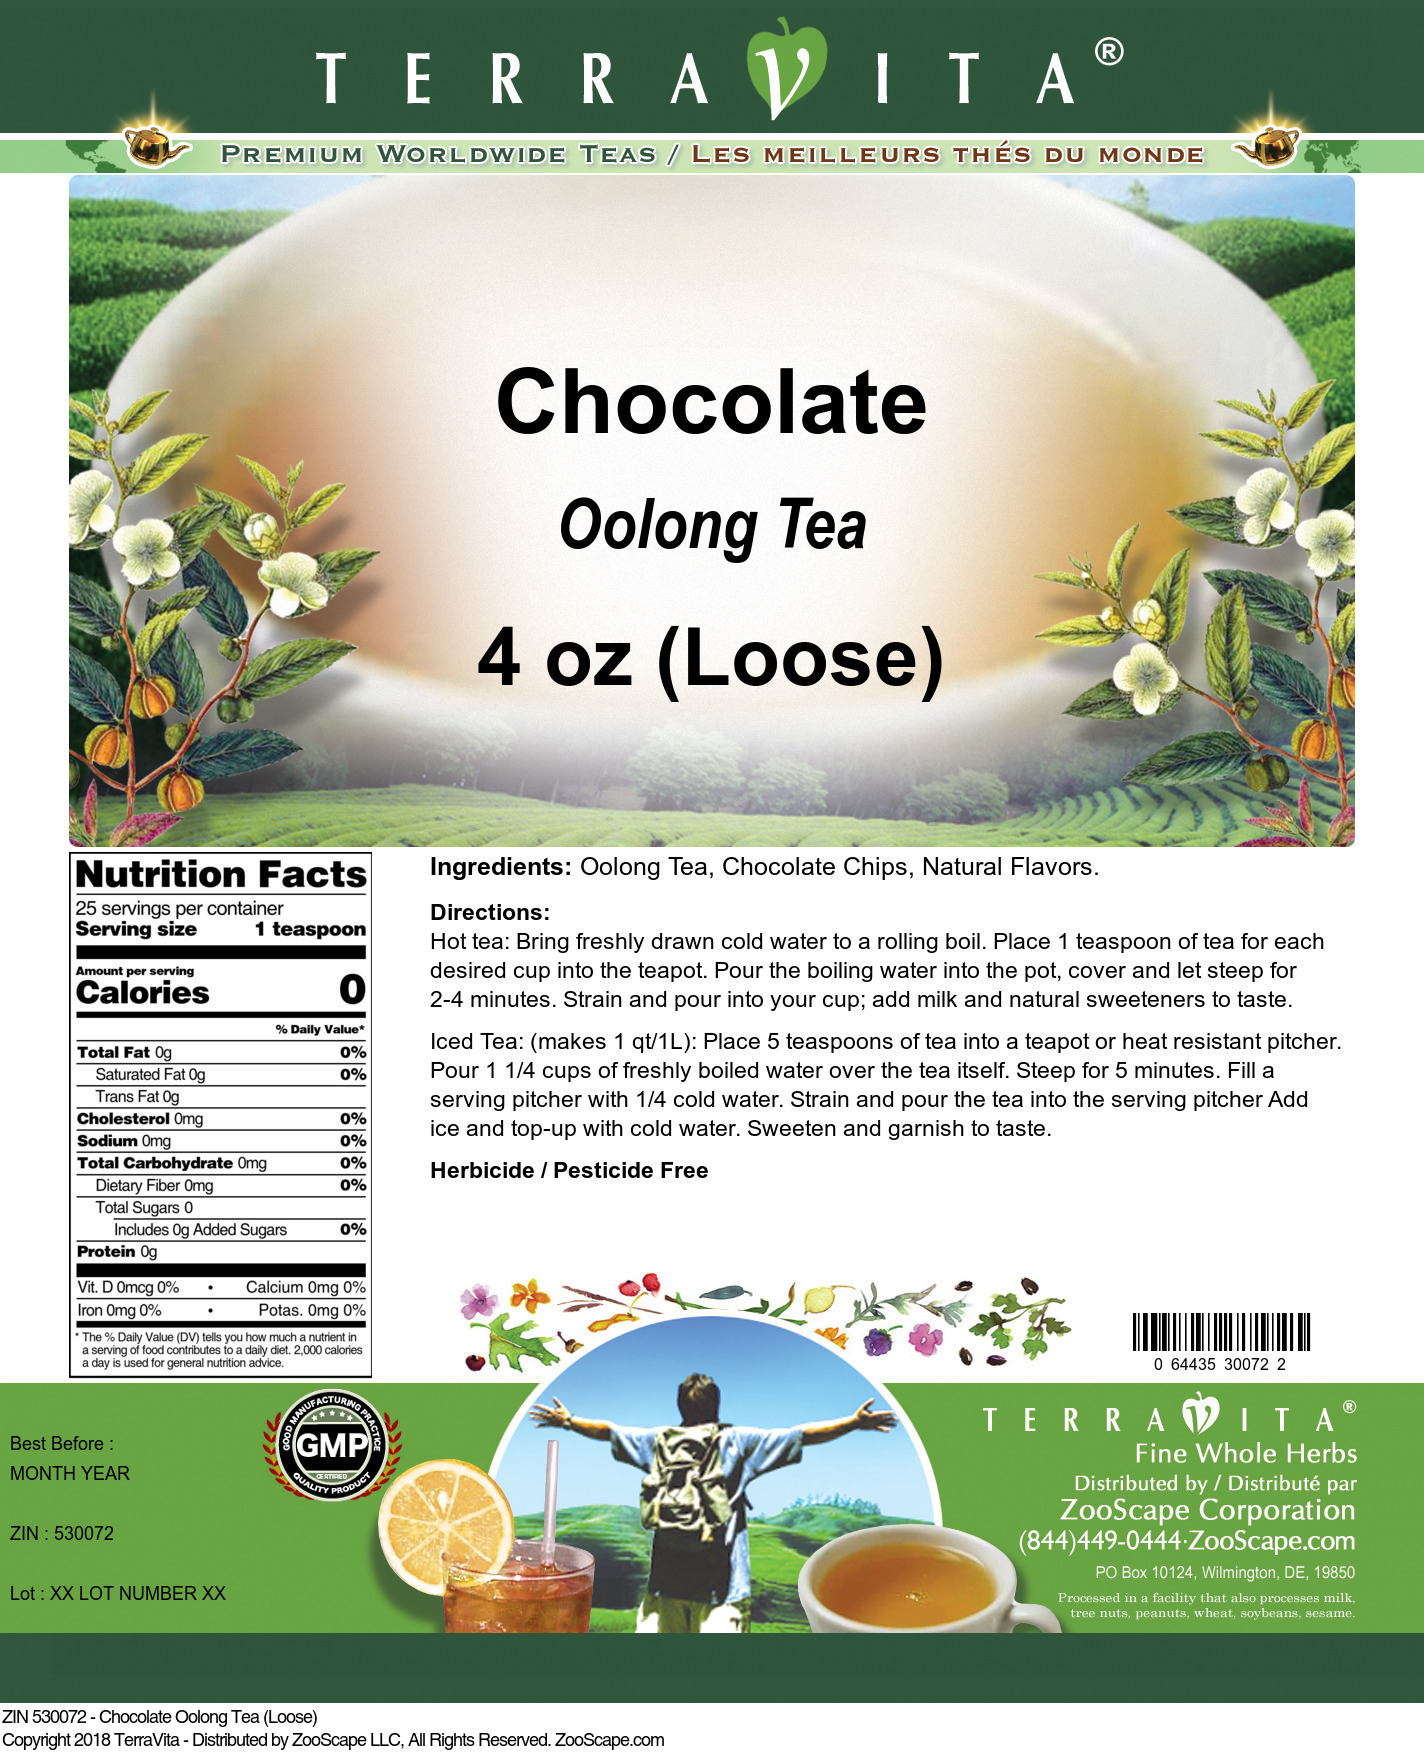 Chocolate Oolong Tea (Loose)